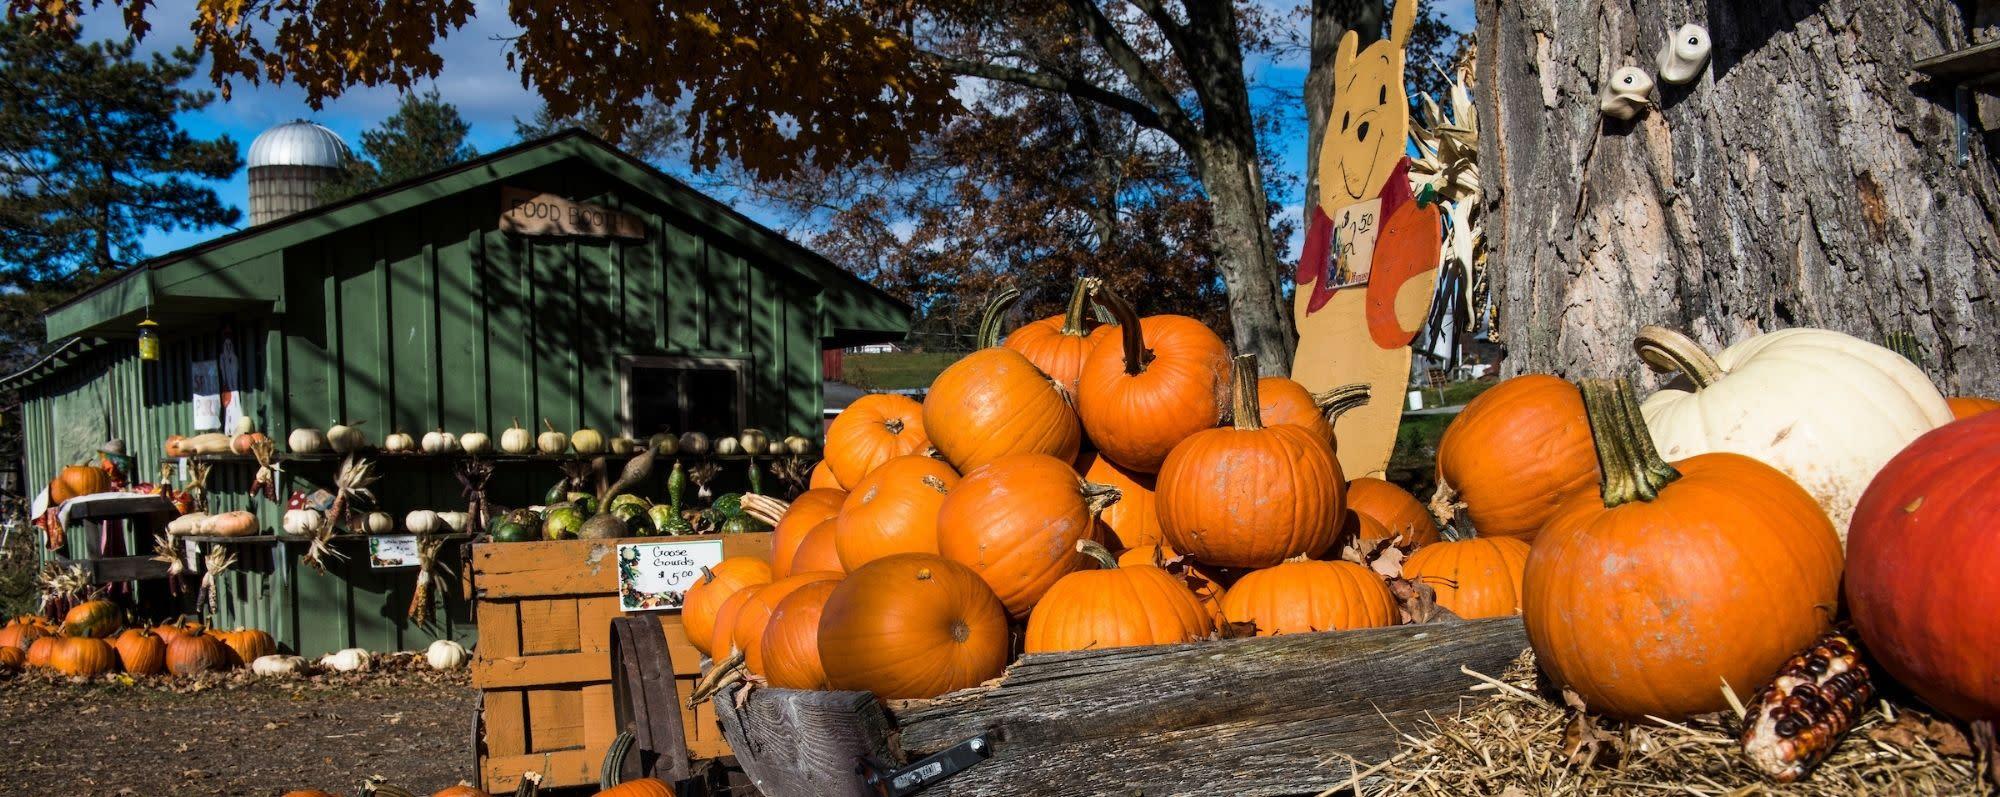 Pumpkins on display at Hahn Farm